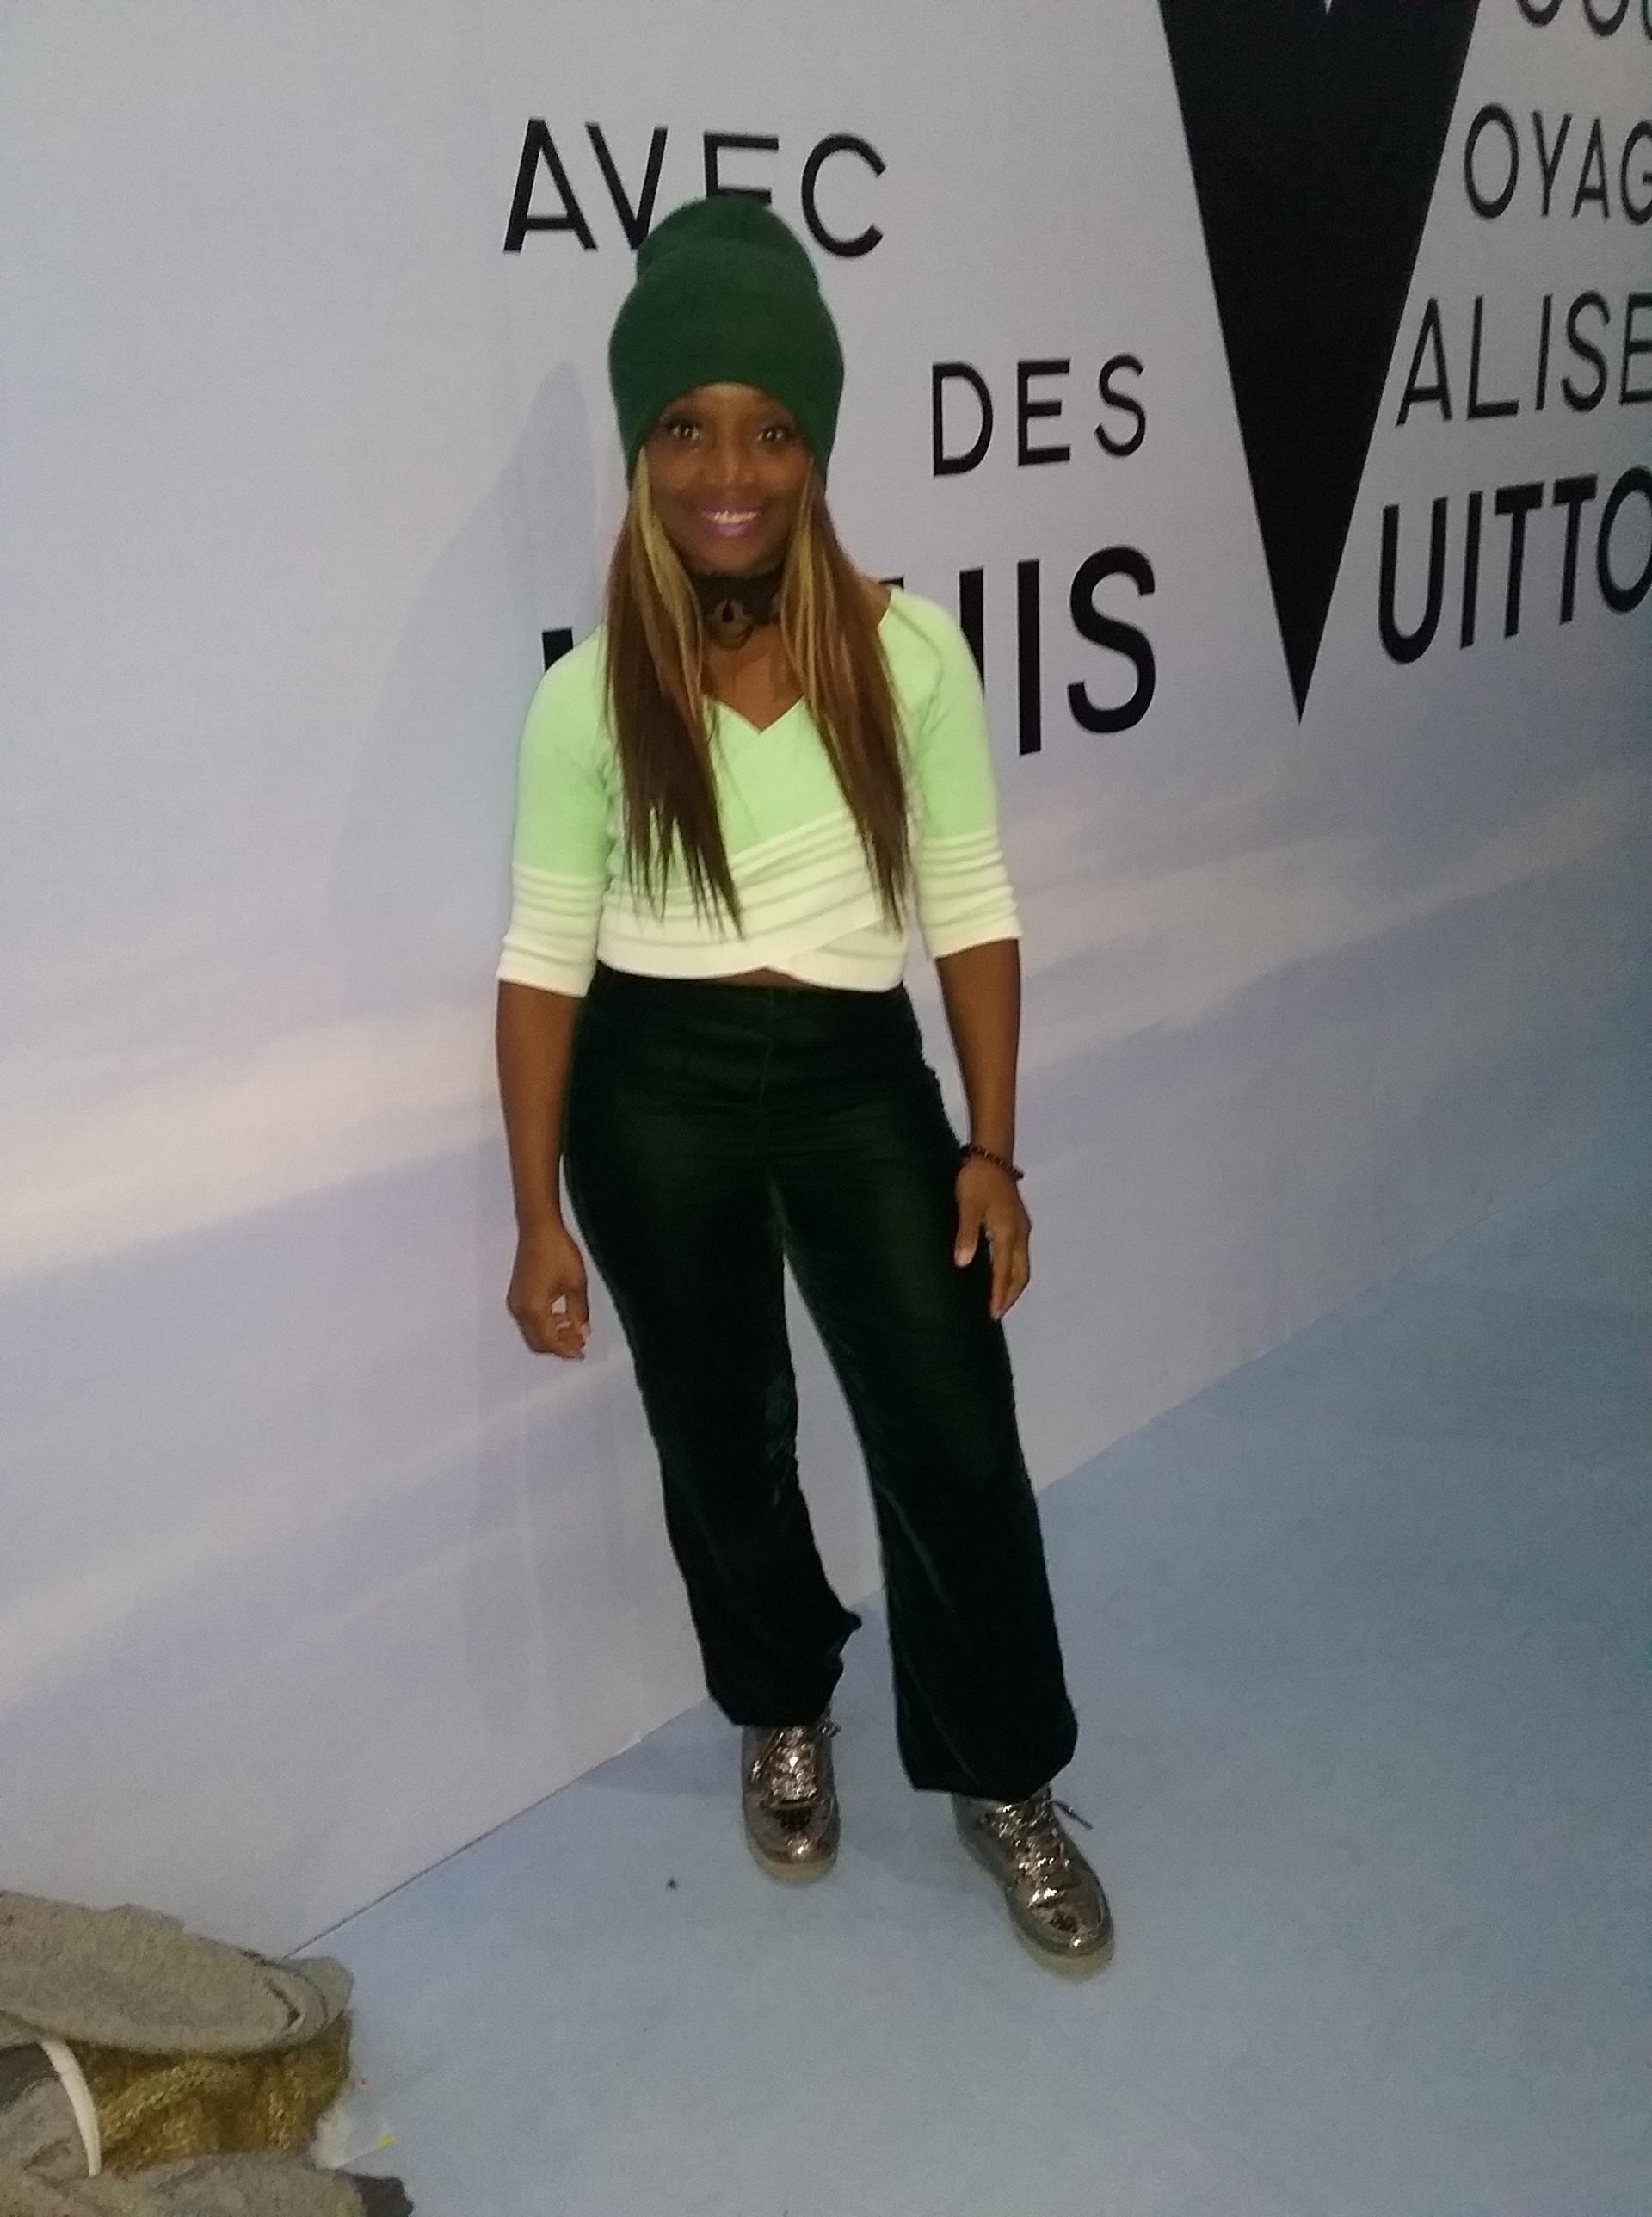 Debra strikes a pose at the Volez, Voguez, Voyagez – Louis Vuitton exhibition pic by @debrafrombrooklyn